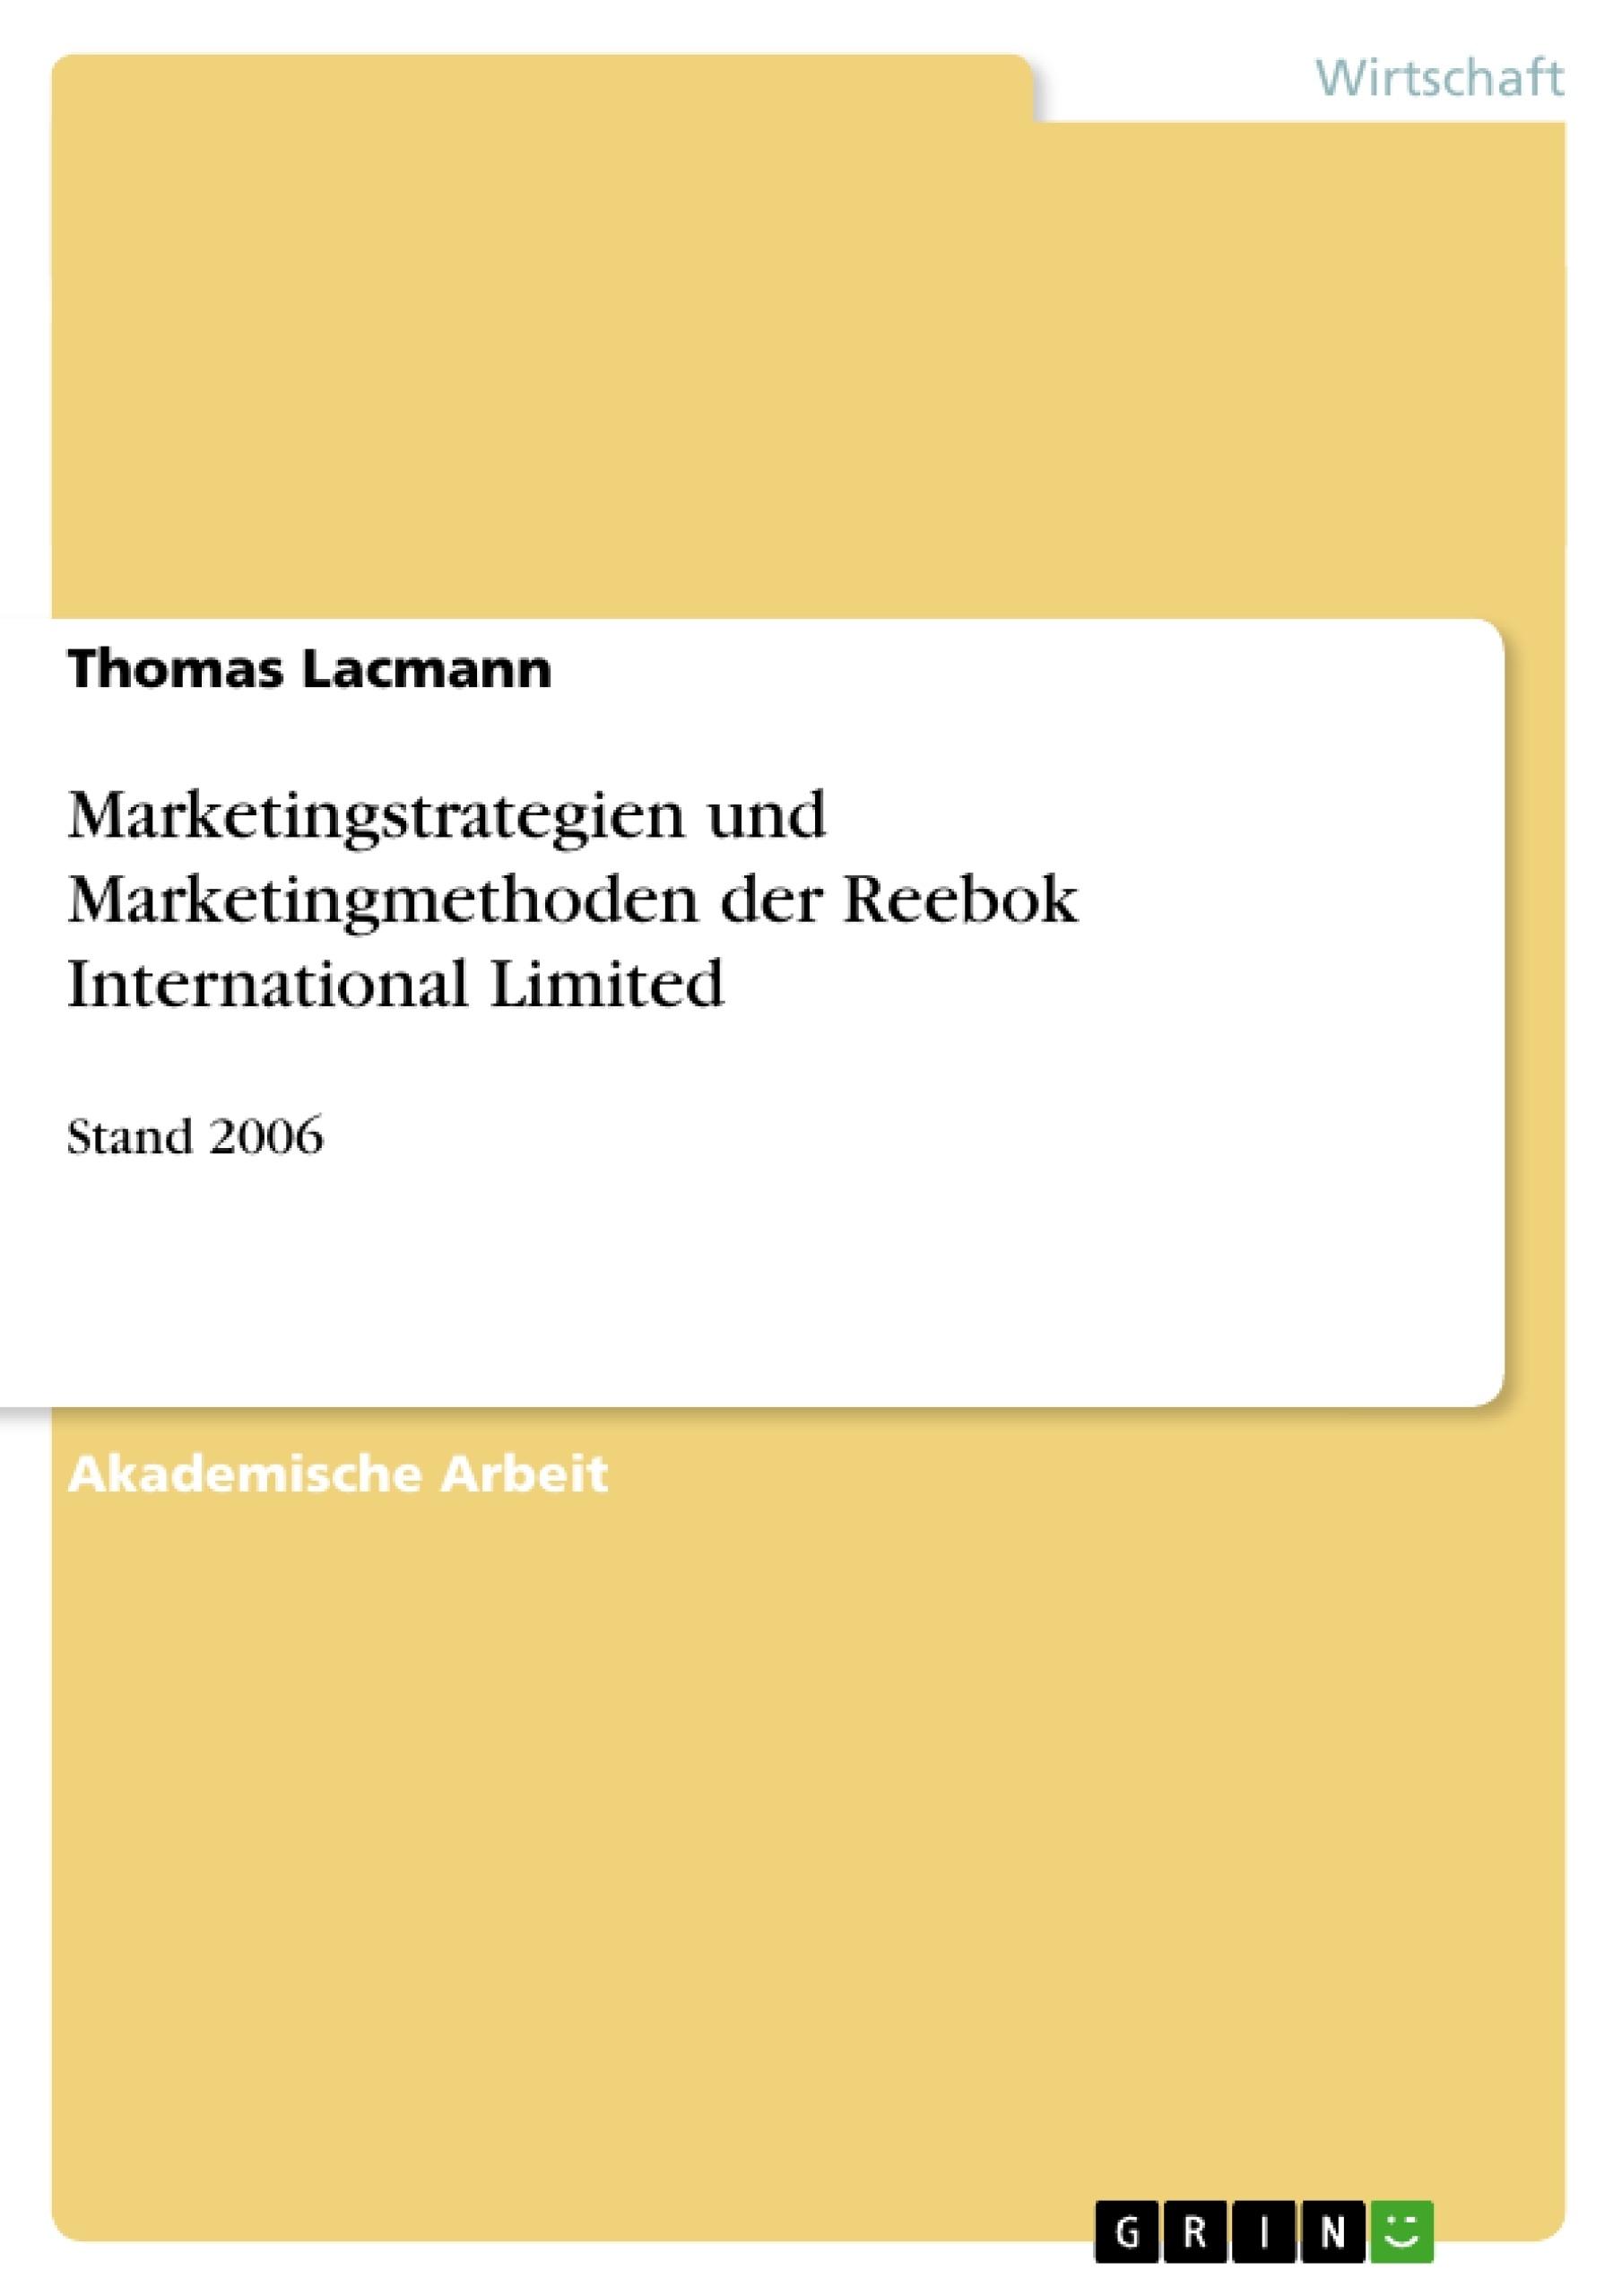 Titel: Marketingstrategien und Marketingmethoden der Reebok International Limited